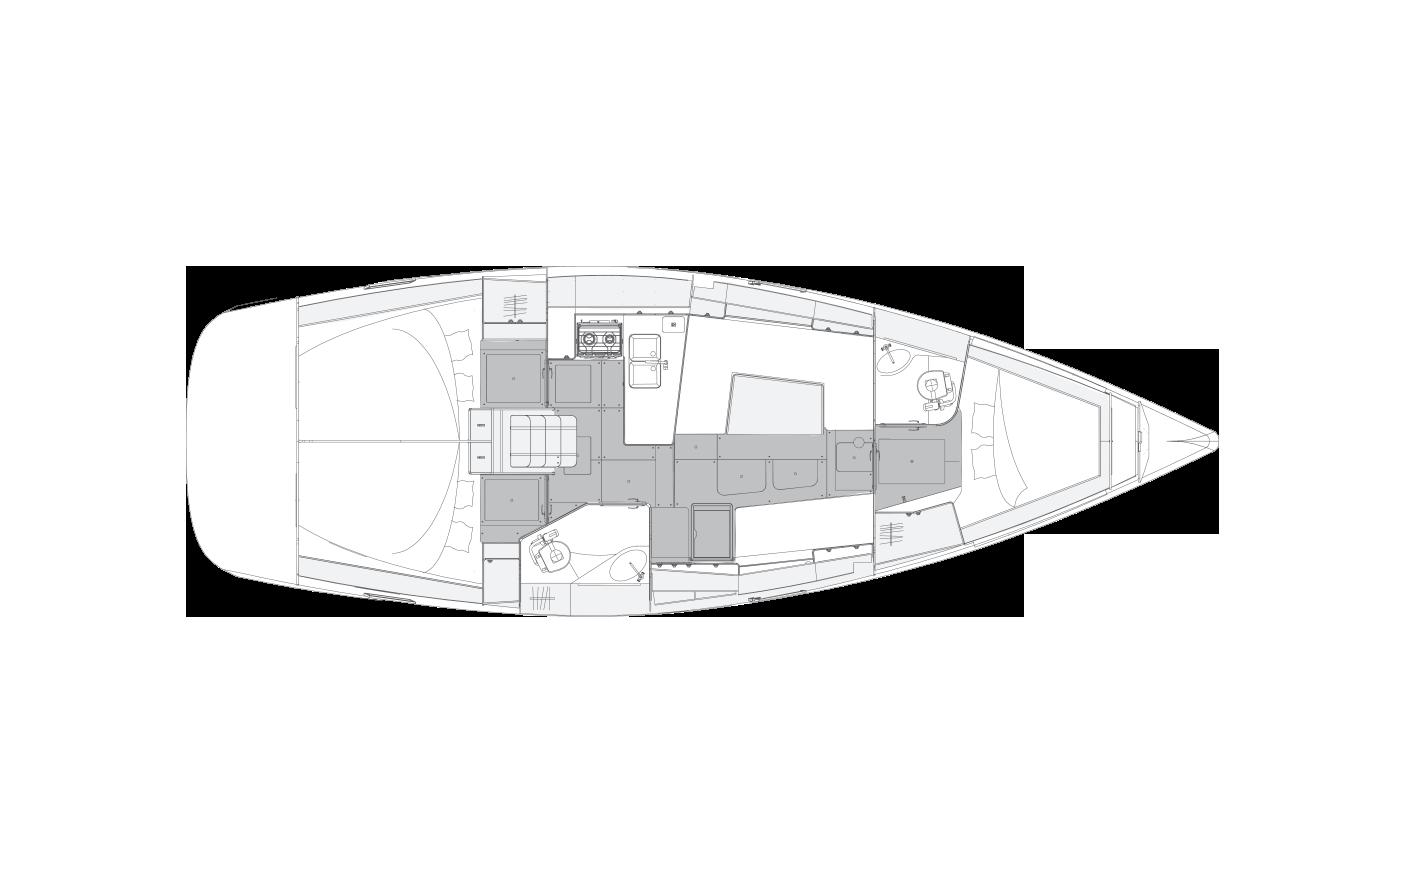 i40.1 - 3 cabins & 2 heads